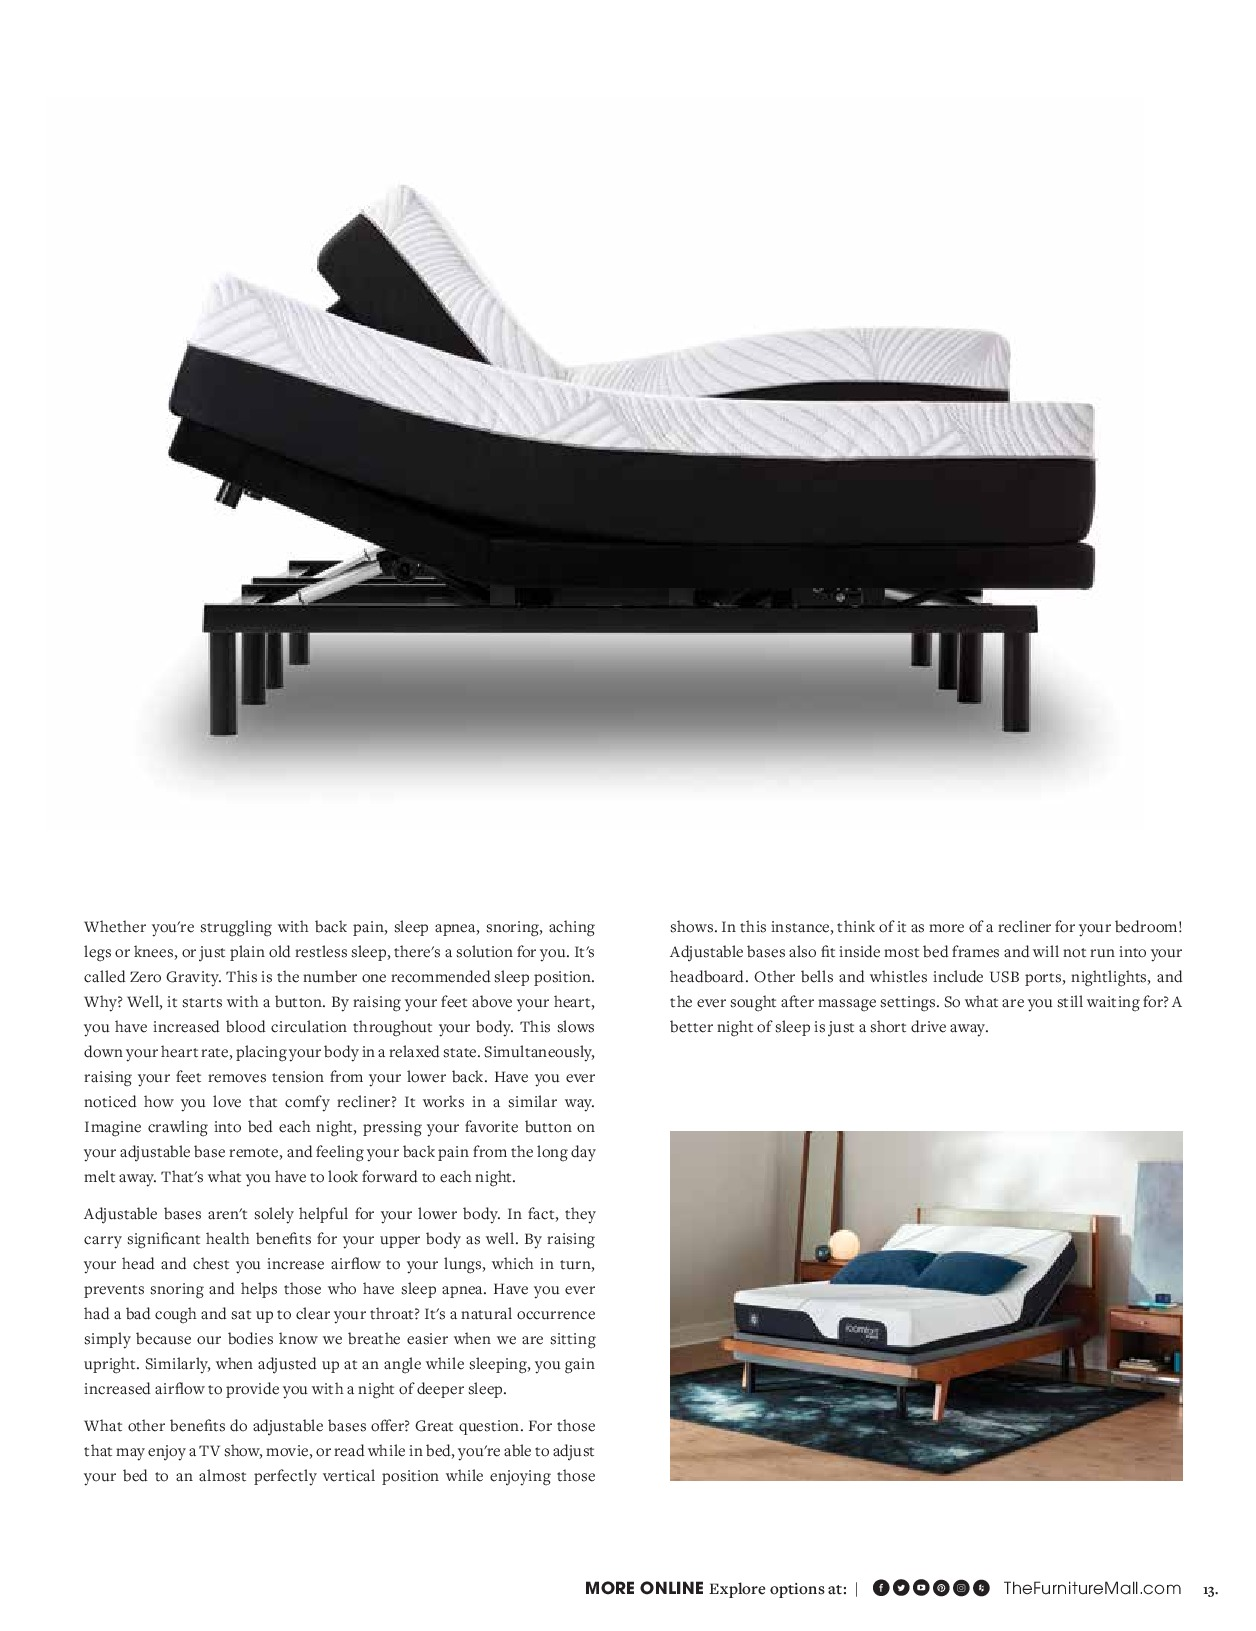 FMOK-9021-2171-SummerLovin-WebSpcl-pages